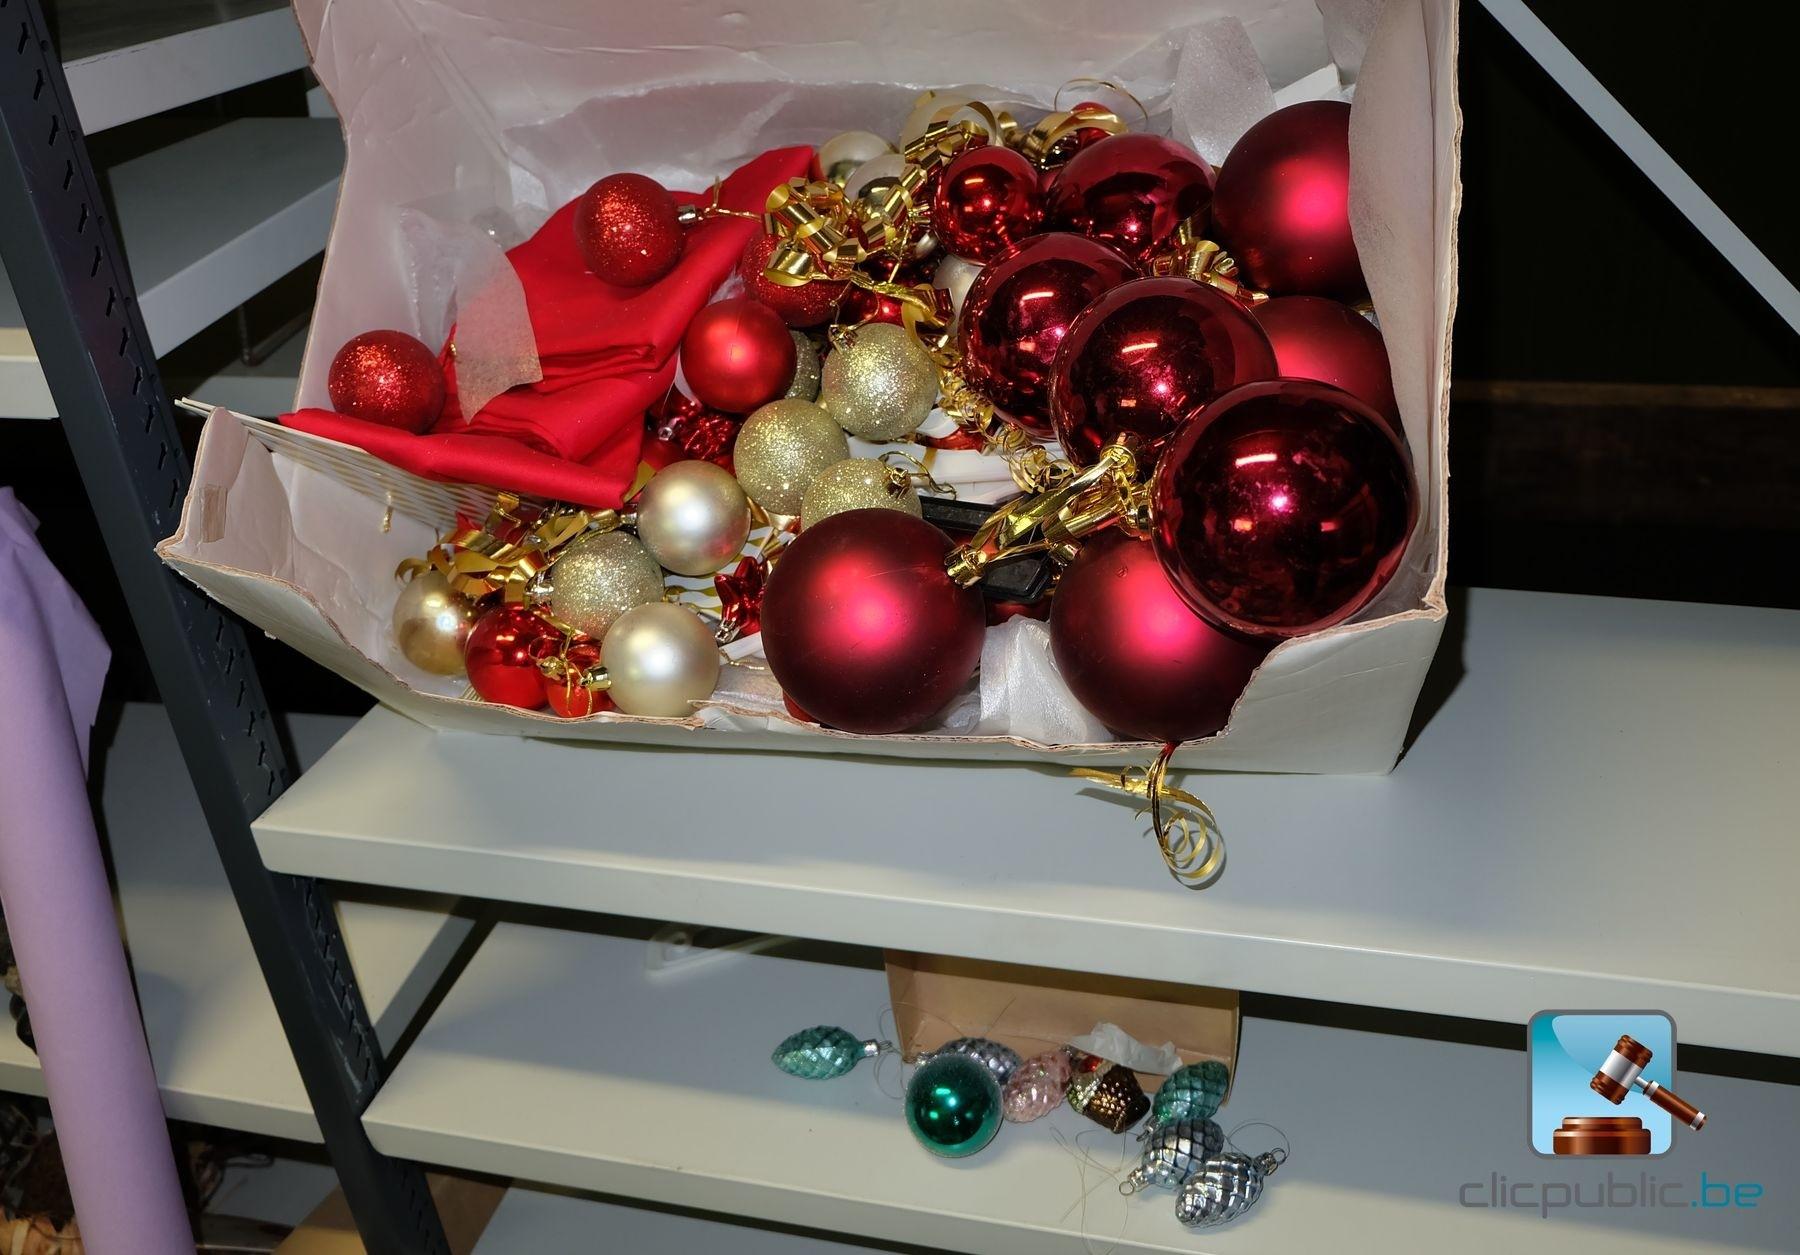 #B21924 Décorations De Noël (ref. 27) à Vendre Sur Clicpublic.be 5319 decorations de noel a vendre 1800x1255 px @ aertt.com